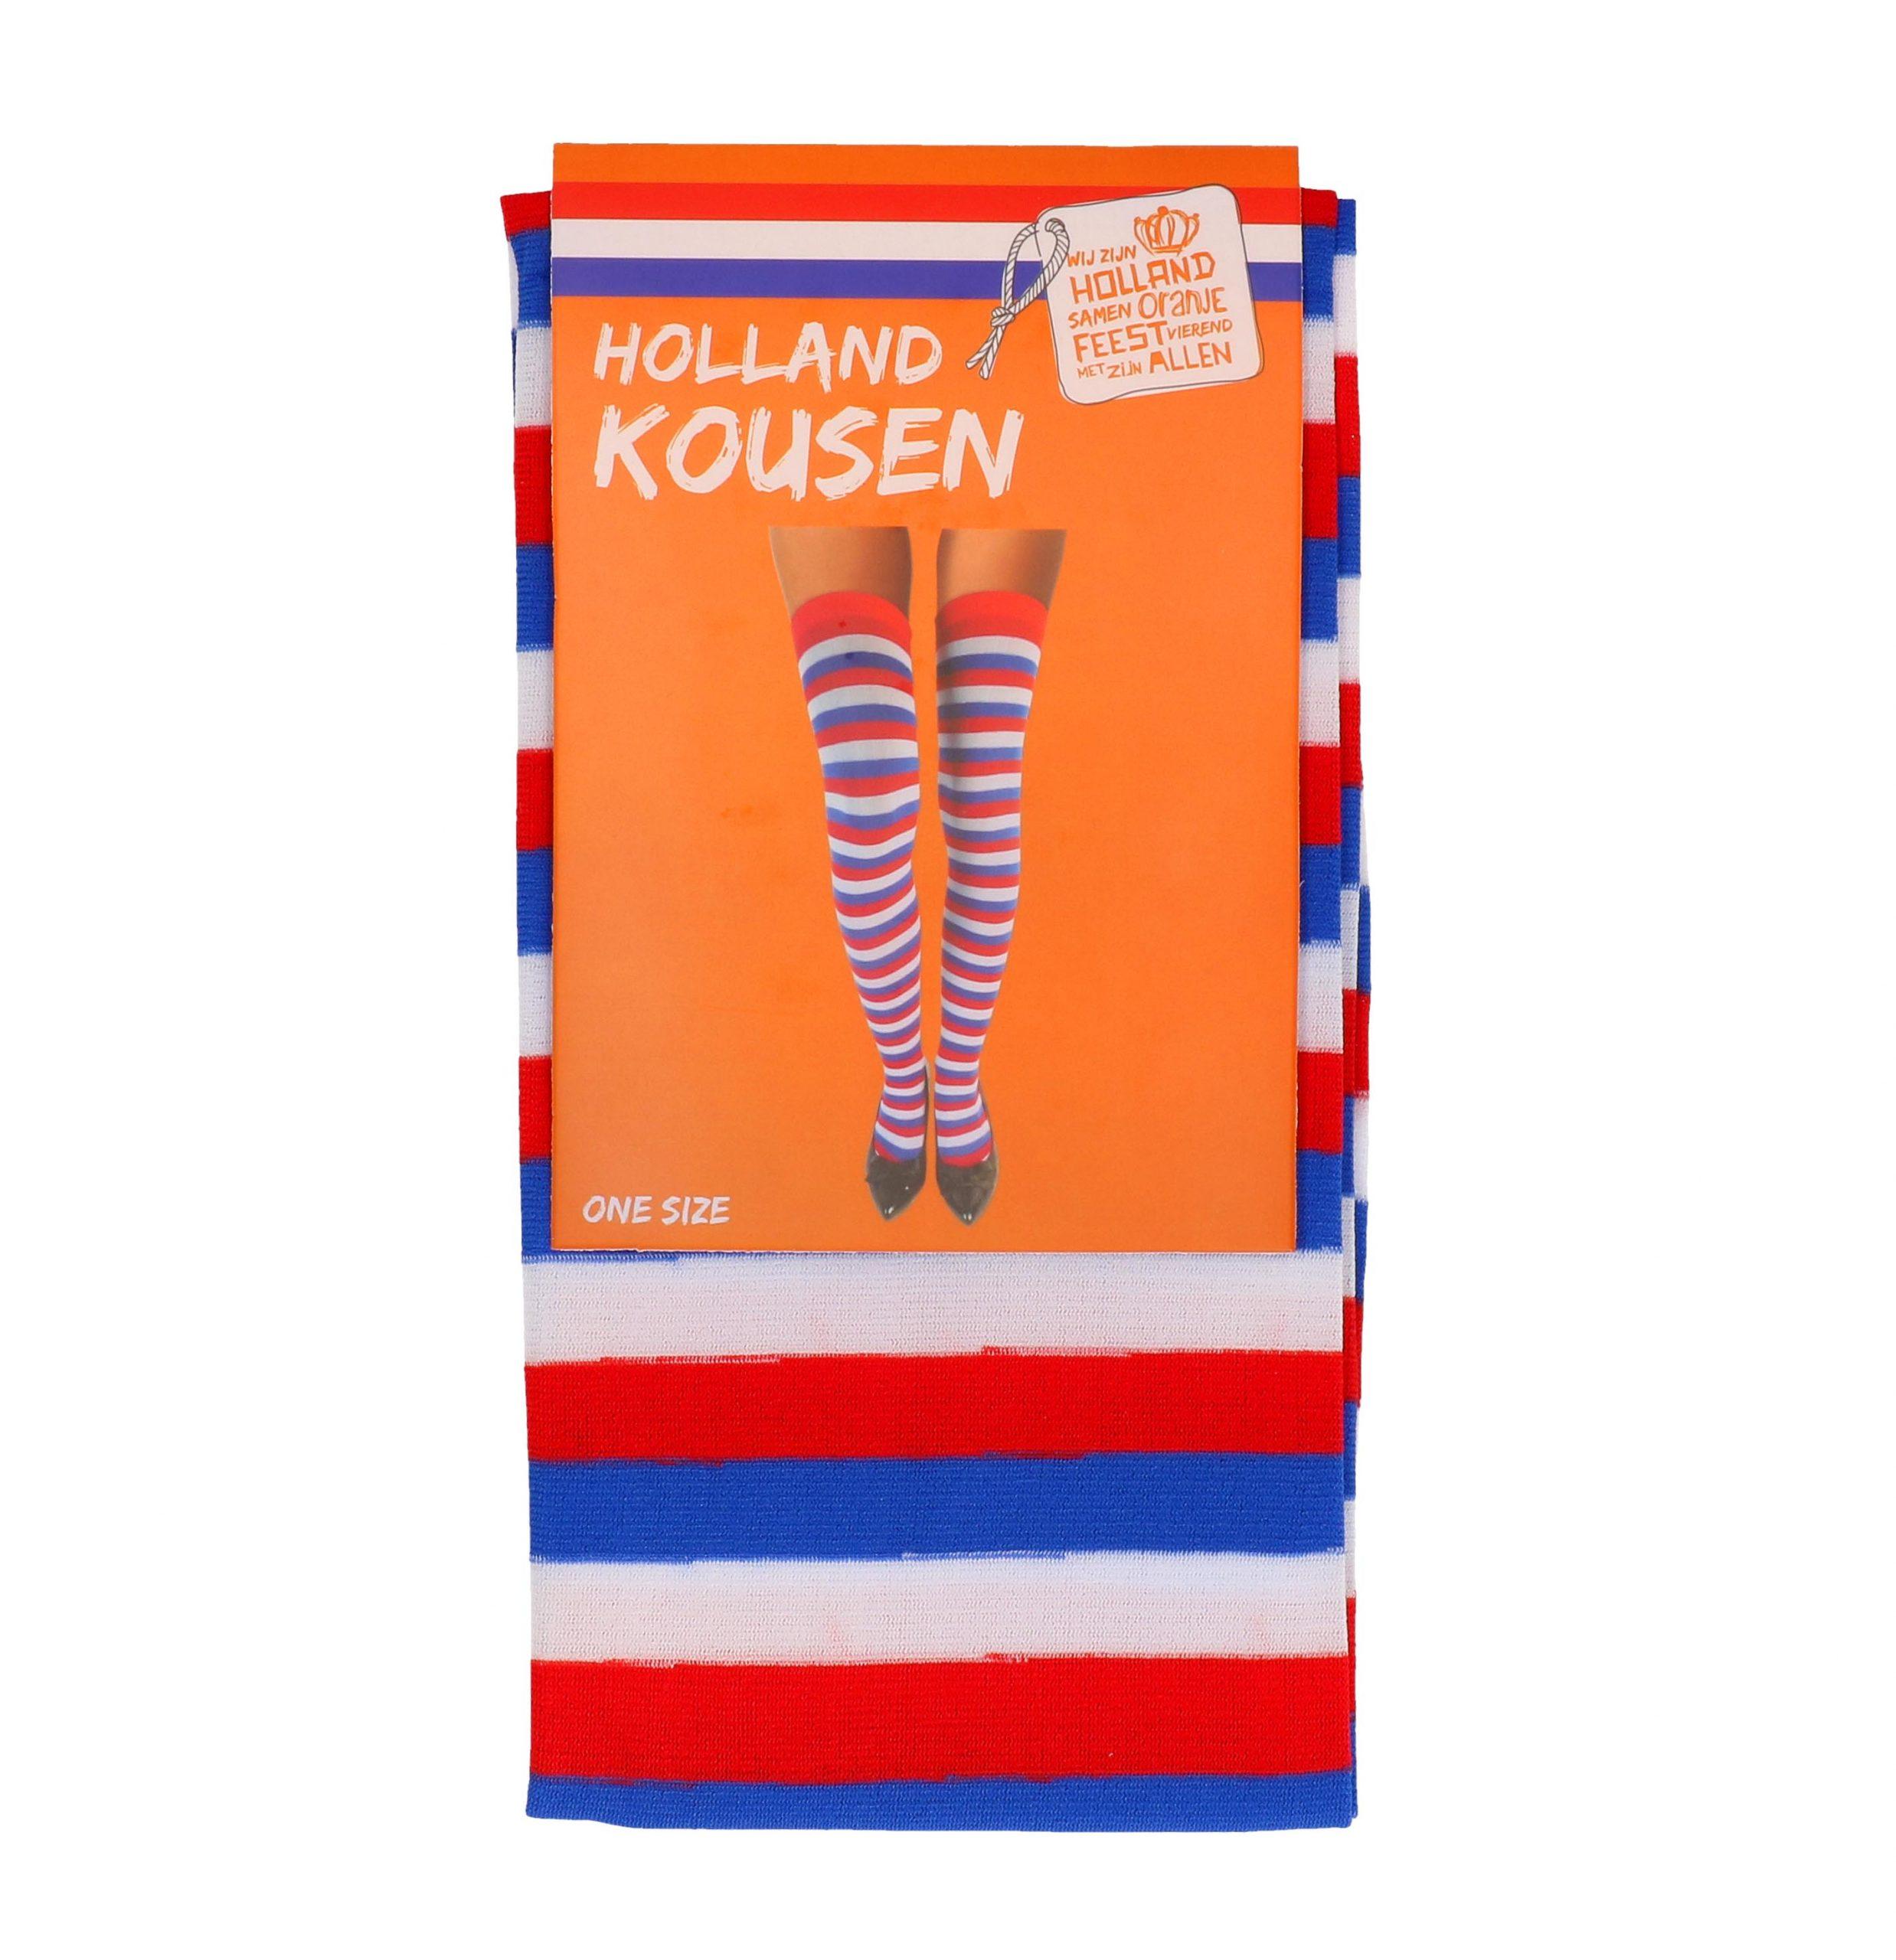 Kousen holland